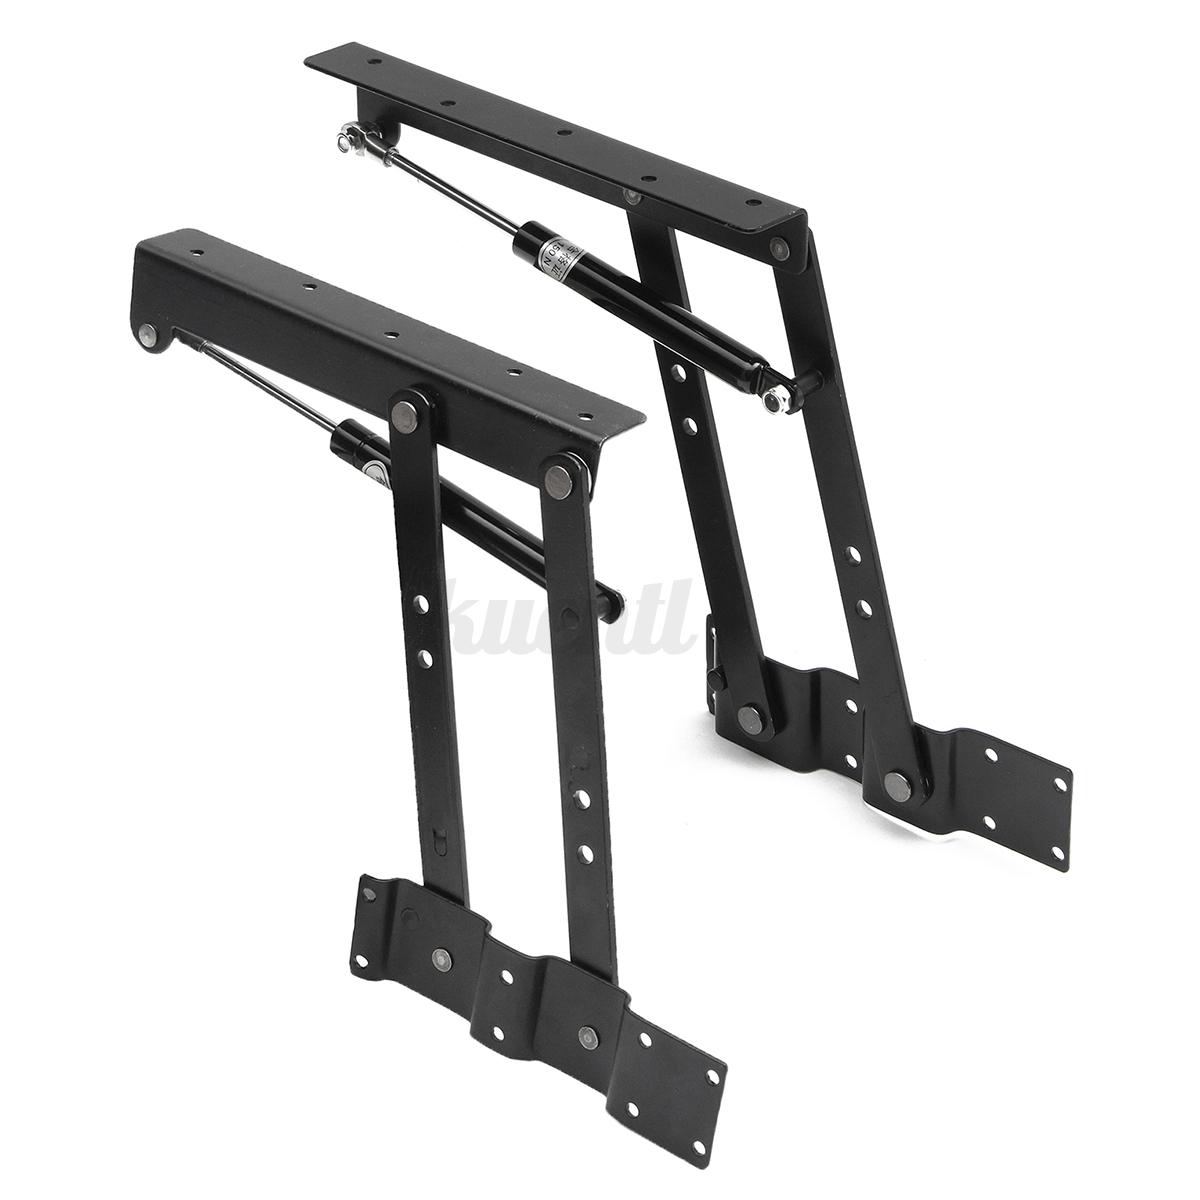 Spring Lift Mechanism : Pair diy lift up top coffee table lifting frame mechanism